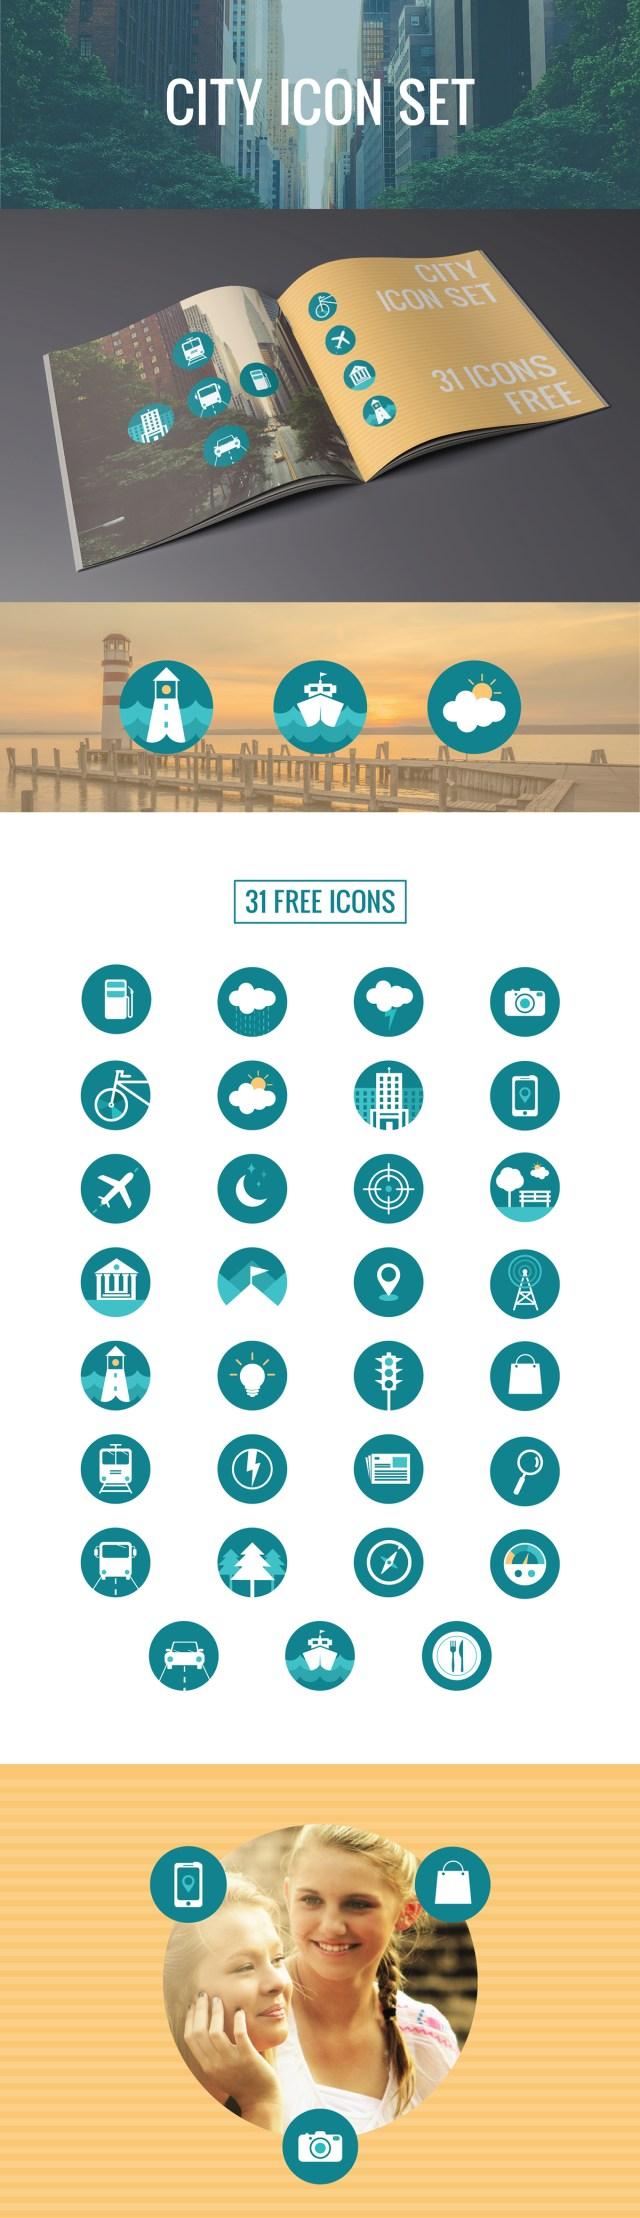 31 Free City Icon